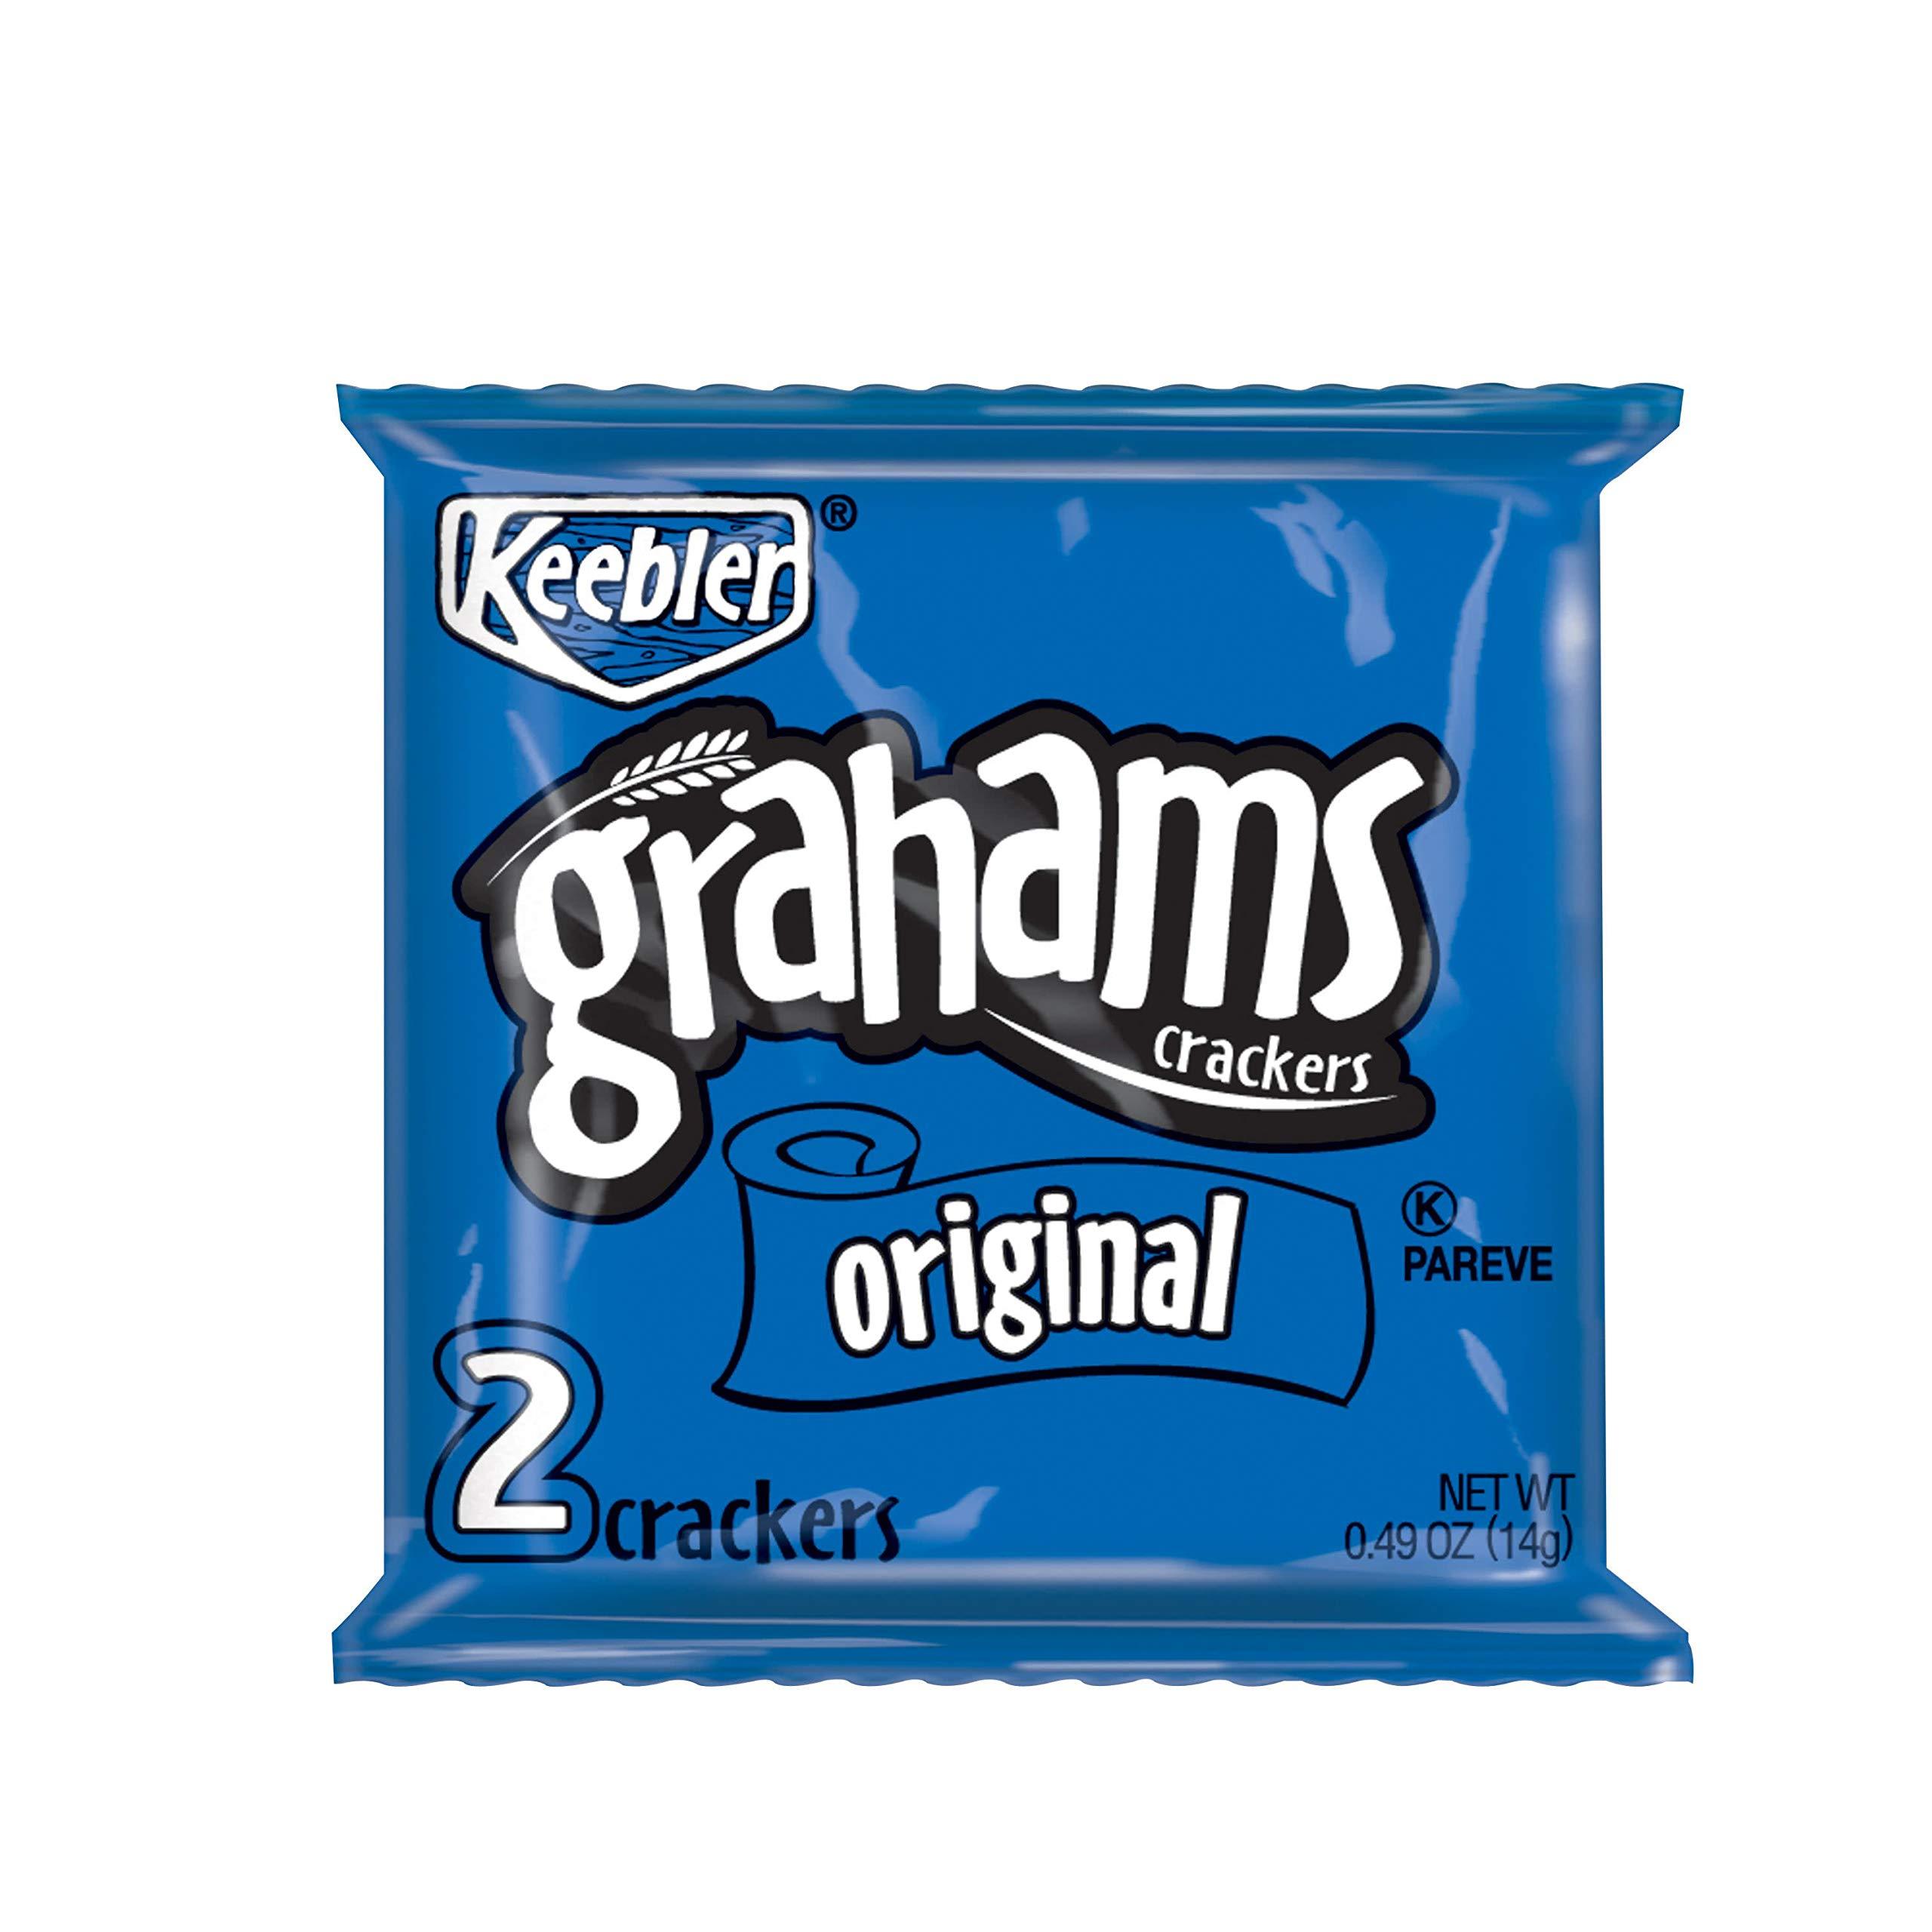 Keebler Grahams Crackers, Original, 0.49 oz Pouch(Pack of 200)